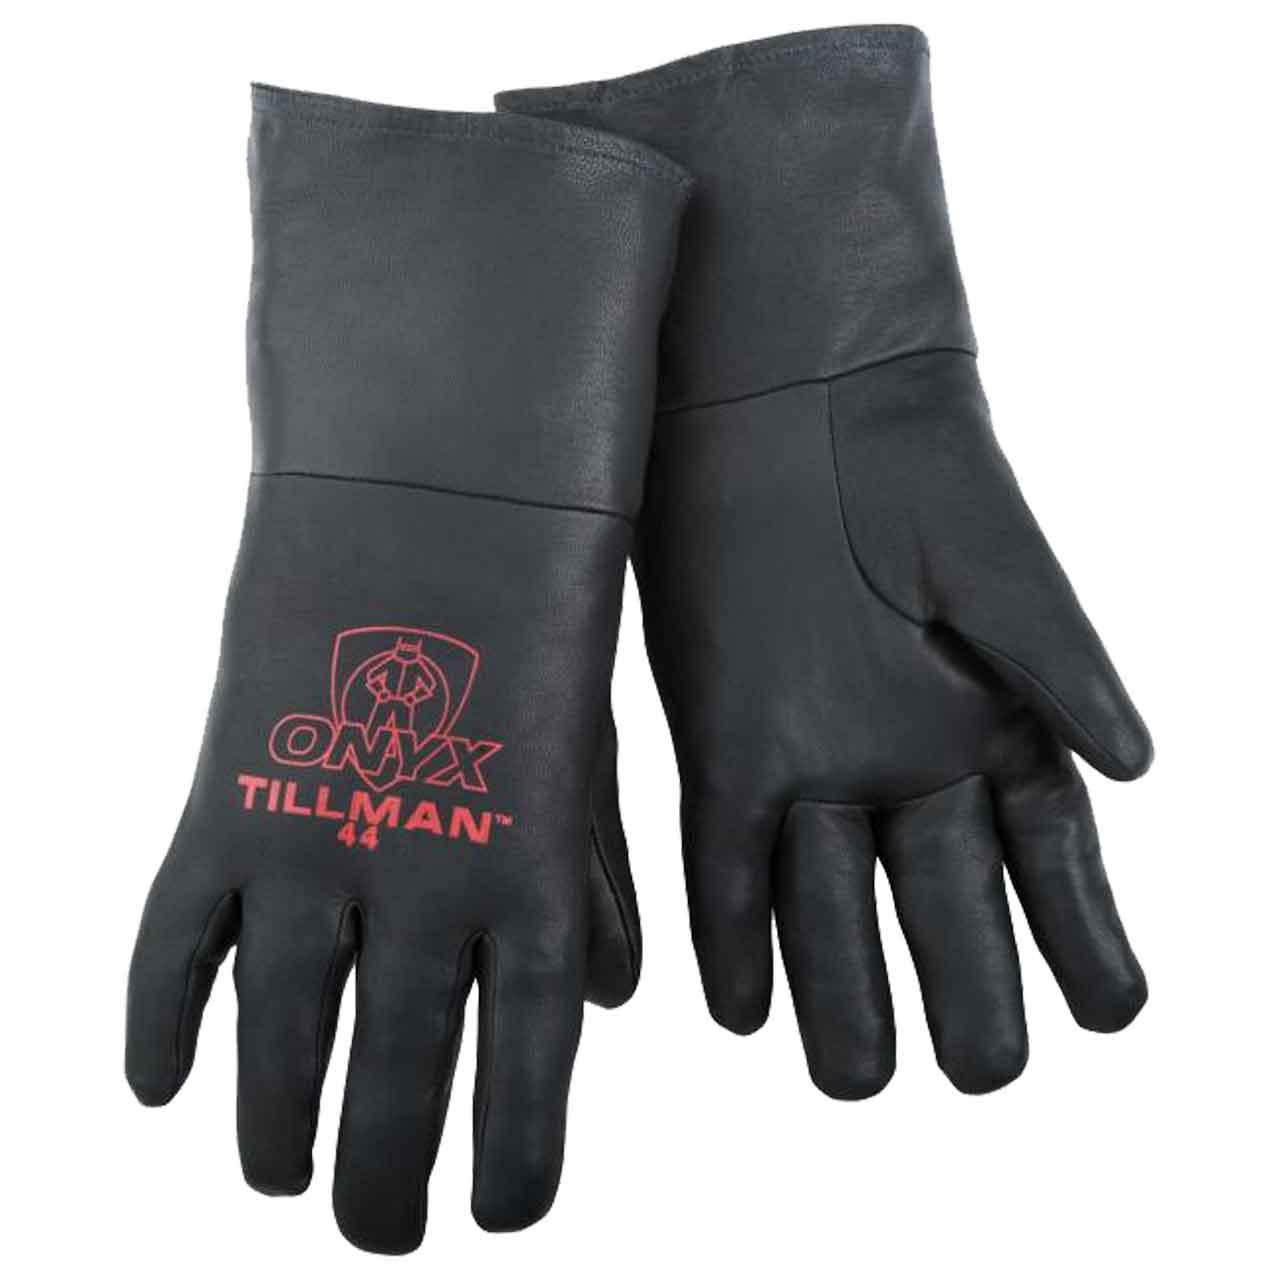 Tillman 44 ONYX 100% Top Grain Black Kidskin TIG Welding Gloves, X-Large